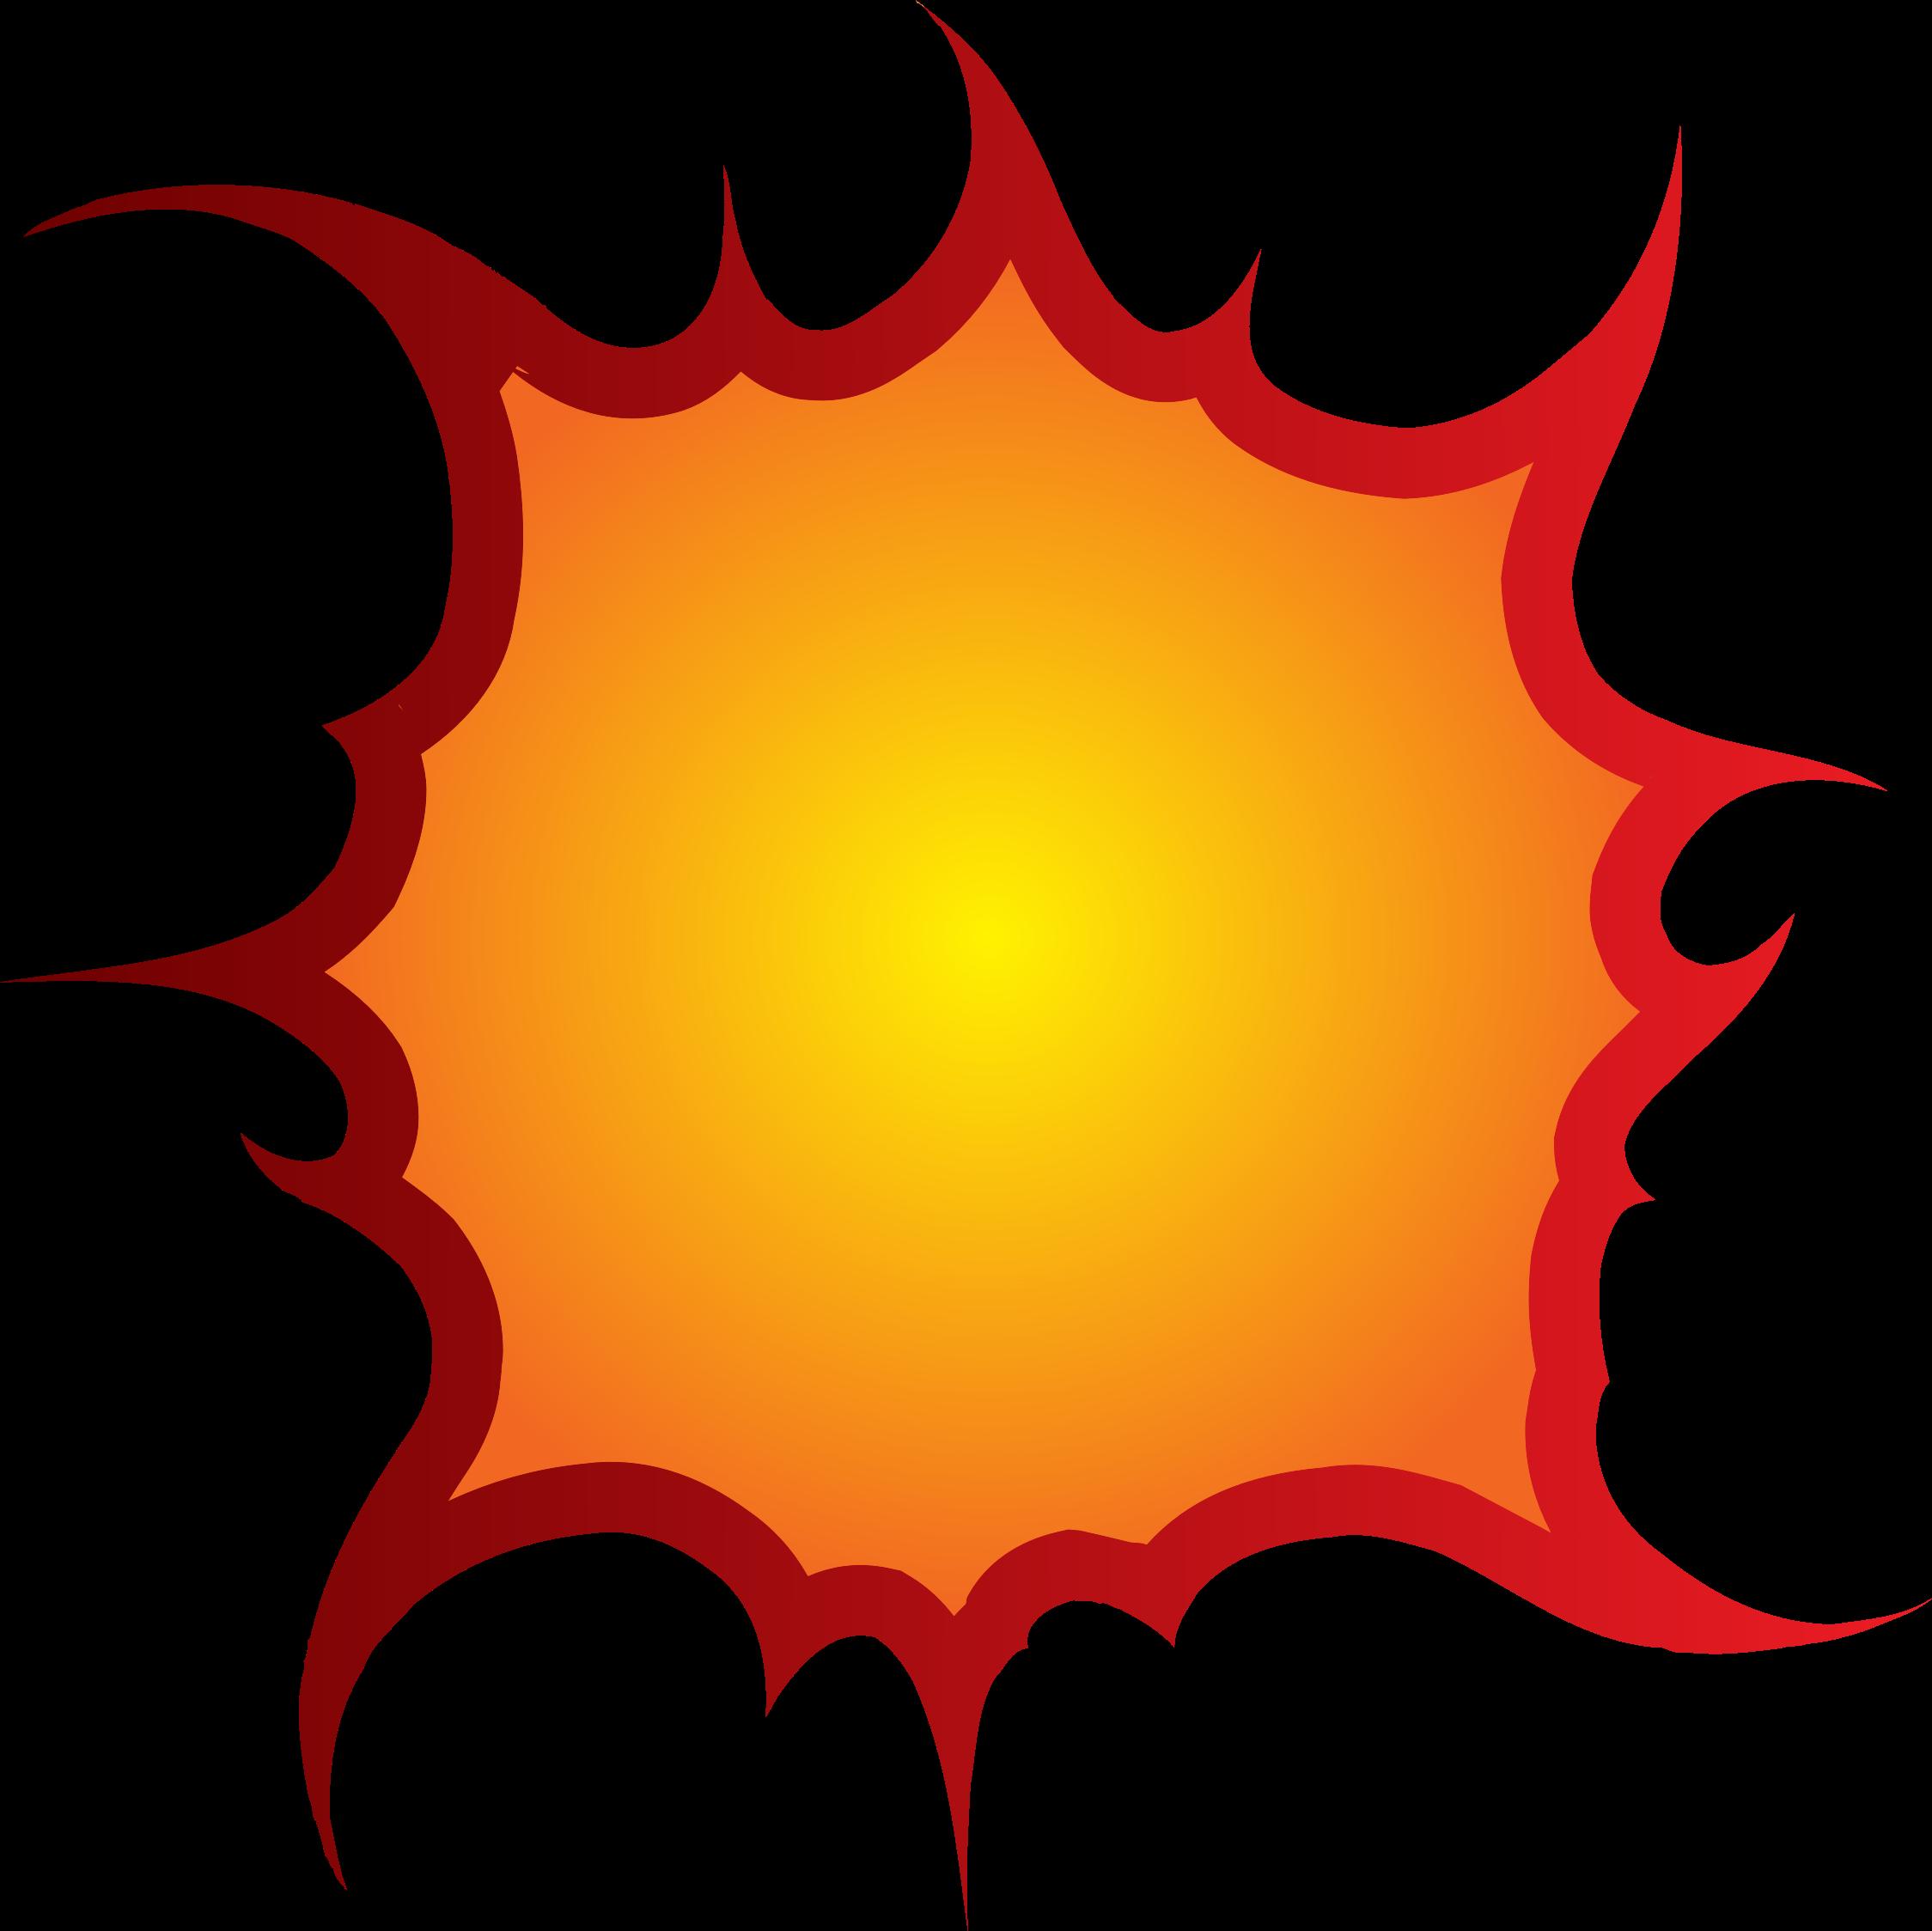 Raseone big image png. Fireball clipart